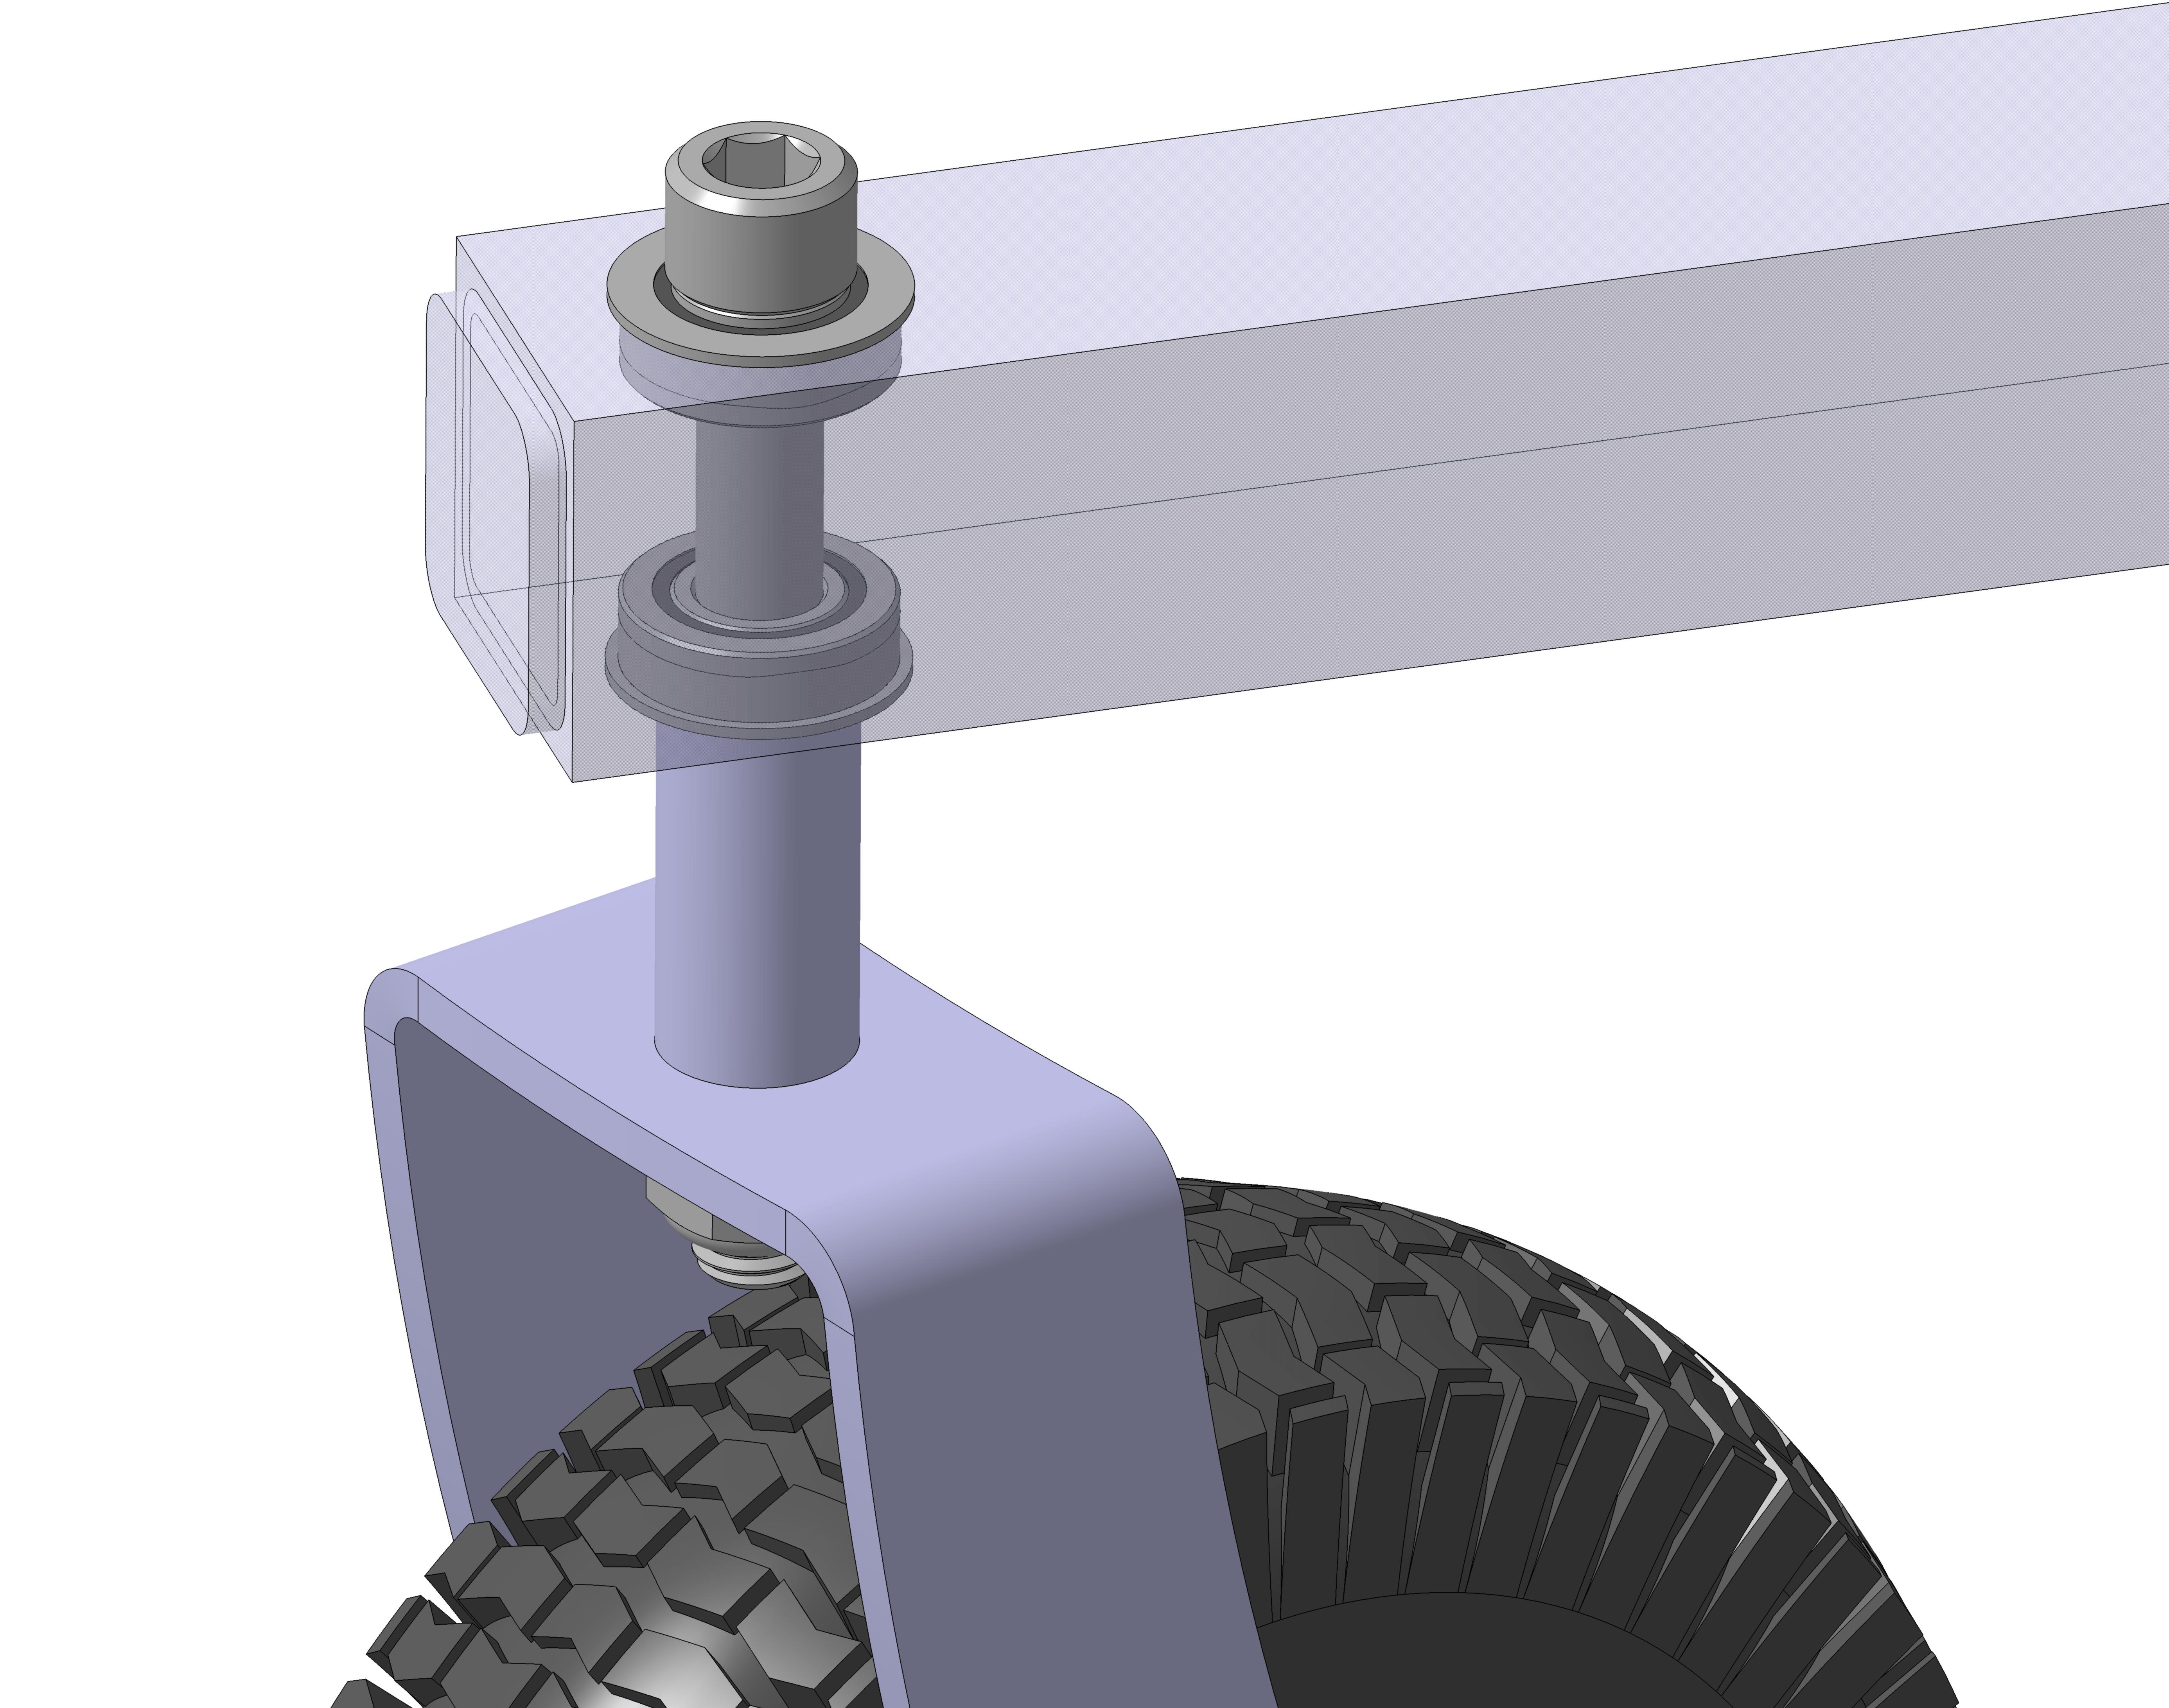 extra flange bearings